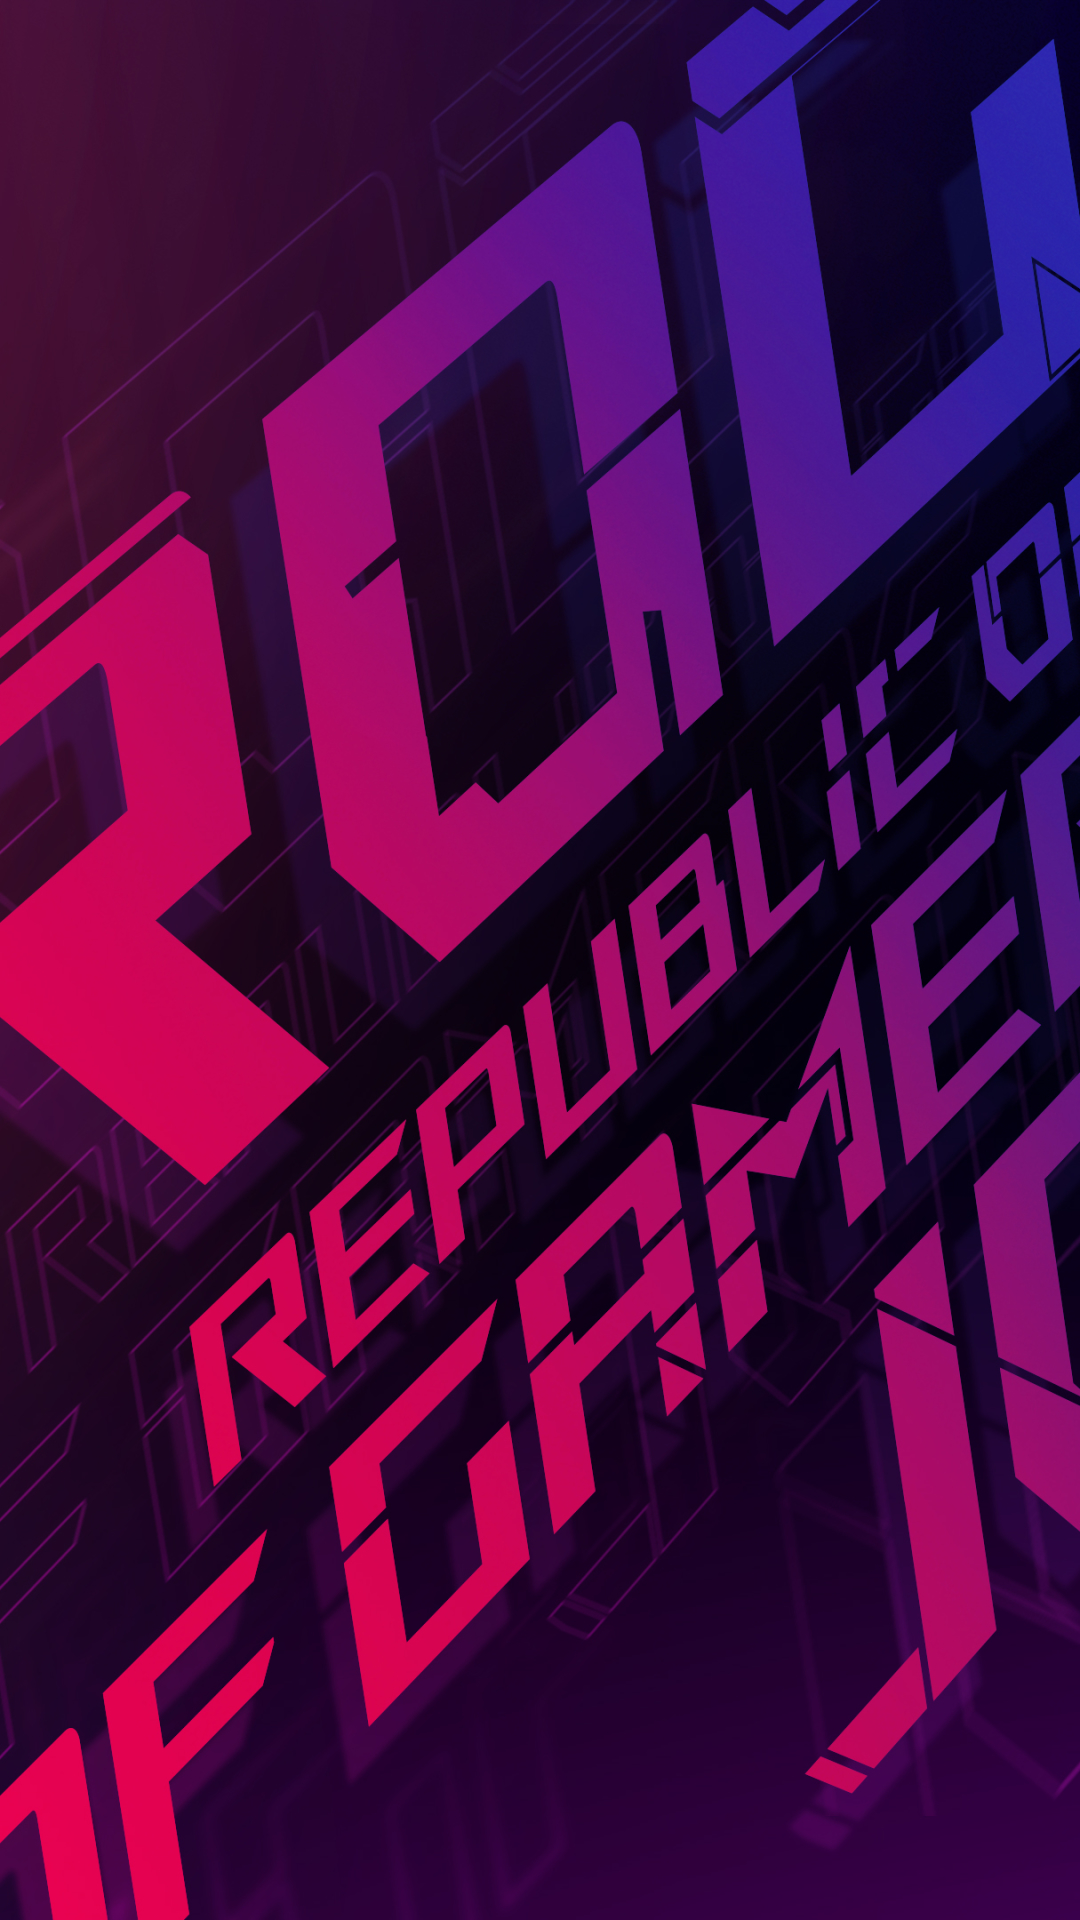 24+ Rog Phone Wallpaper Hd - Bizt Wallpaper